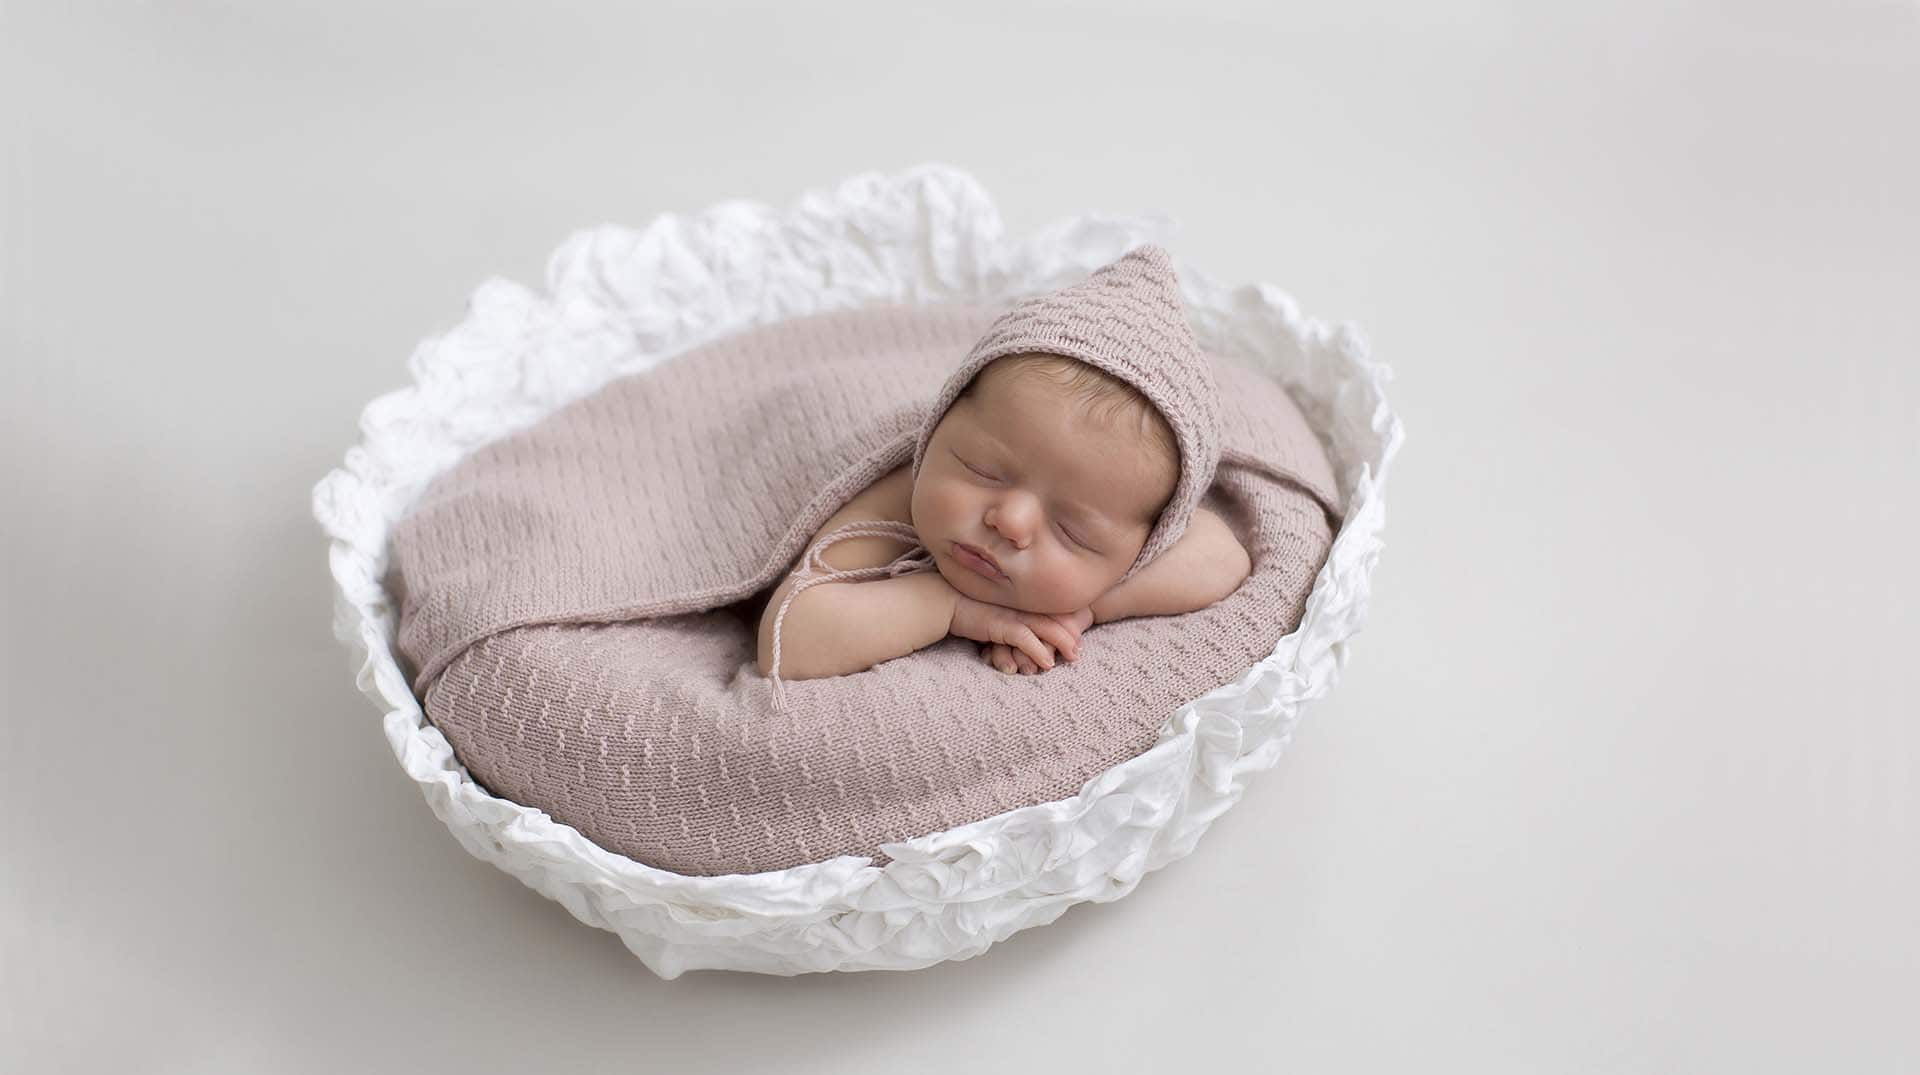 gideon-vessel-basket-bowl-luxurious-pixie-hat-bonnet-wrap-all-newborn-photo-photography-prop-white-dusty-pink